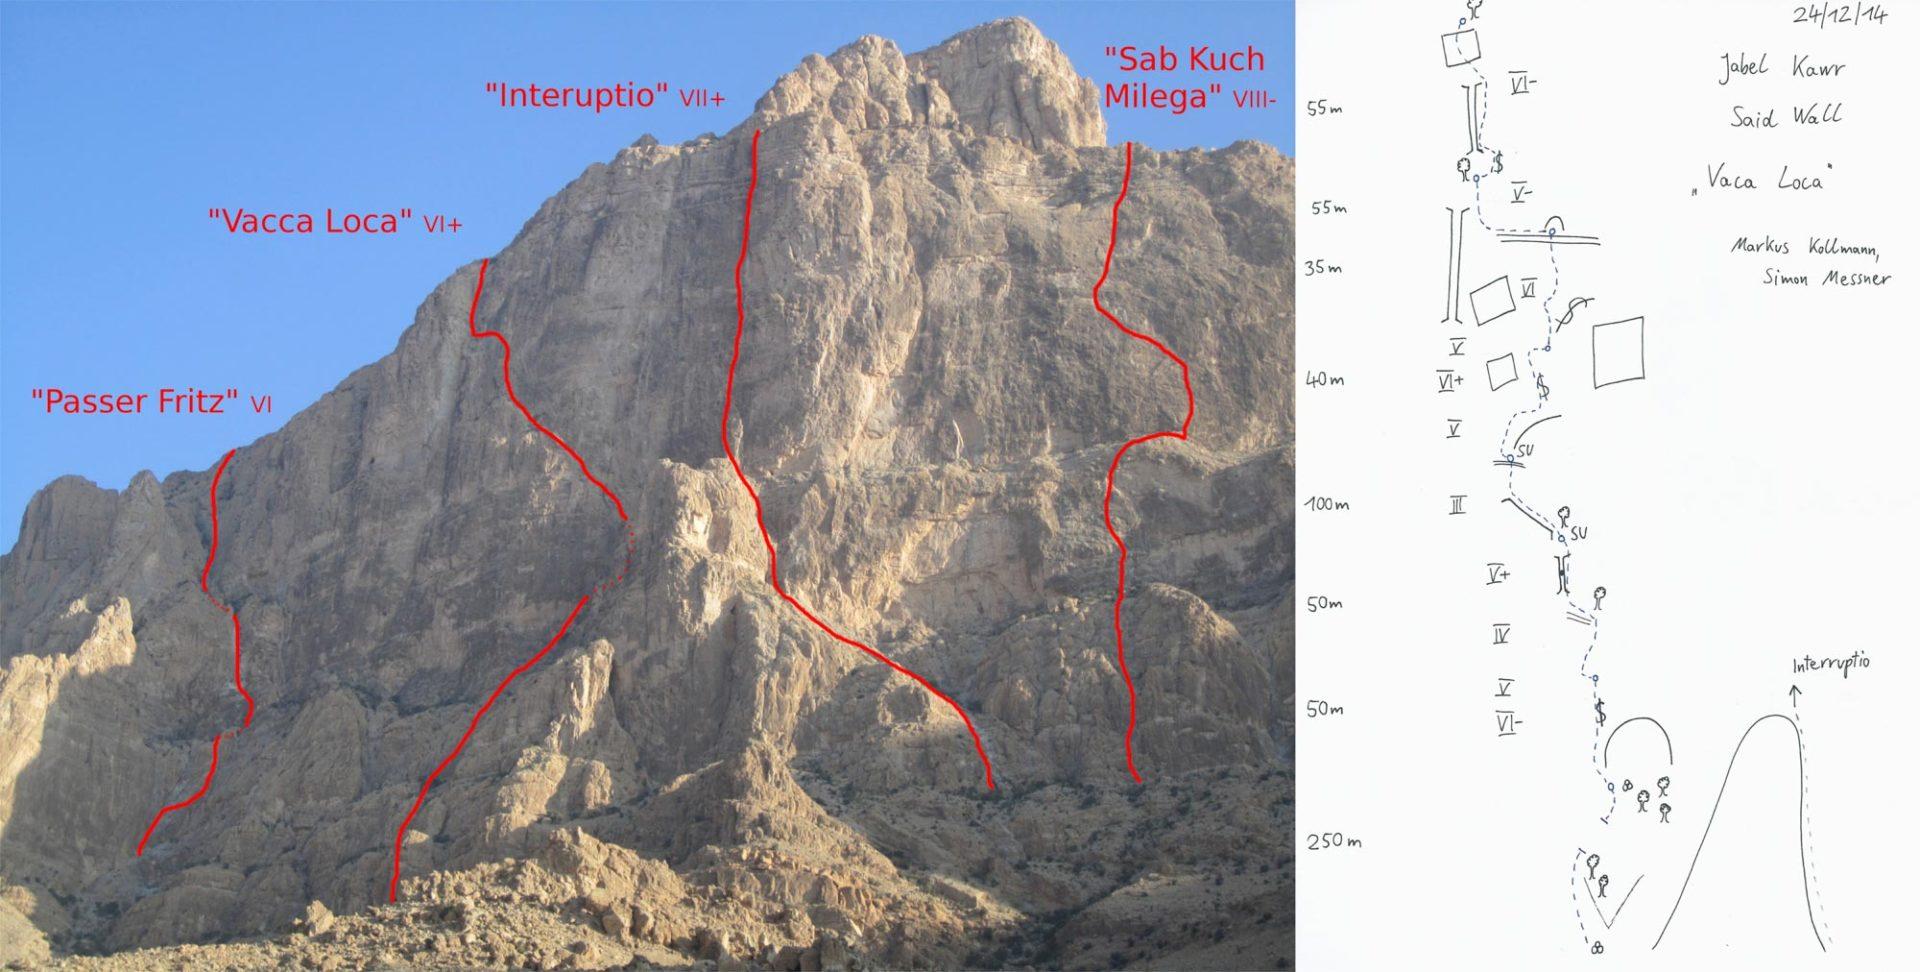 Vaca Loca @ Markus Kollmann und Simon Messner